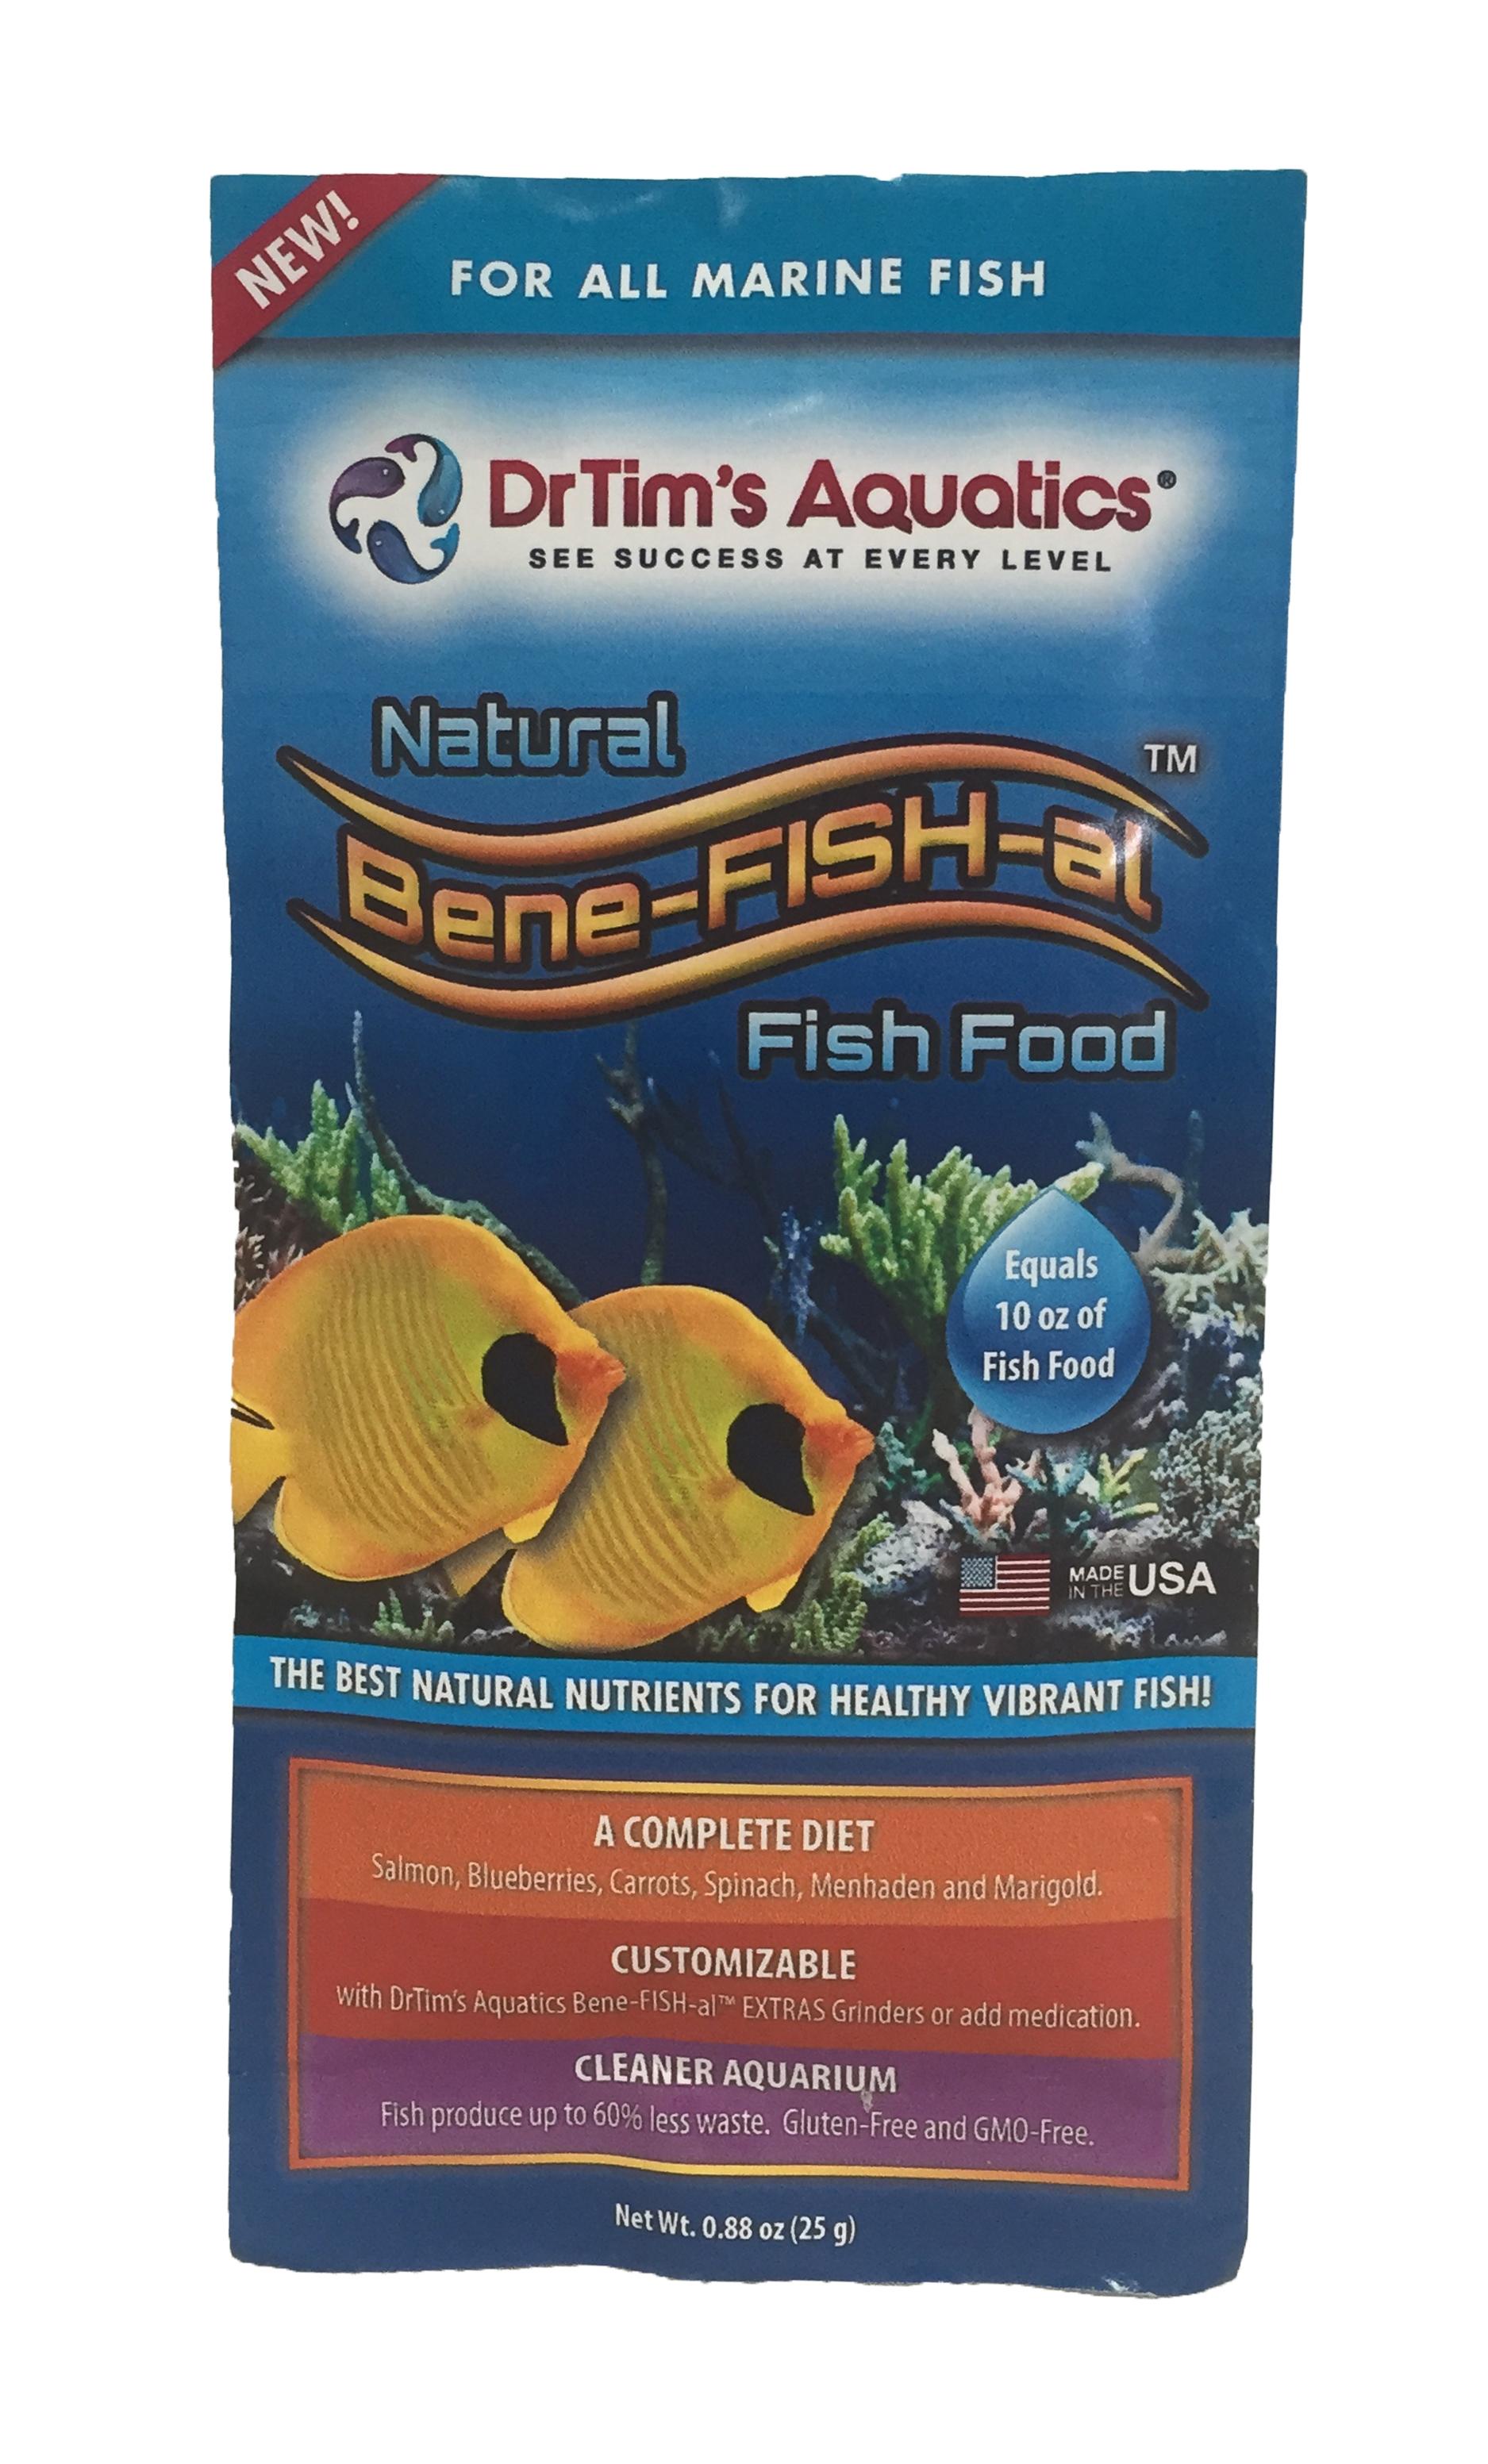 Bene Fish Al Marine Fish Food Single Pack Dt 710